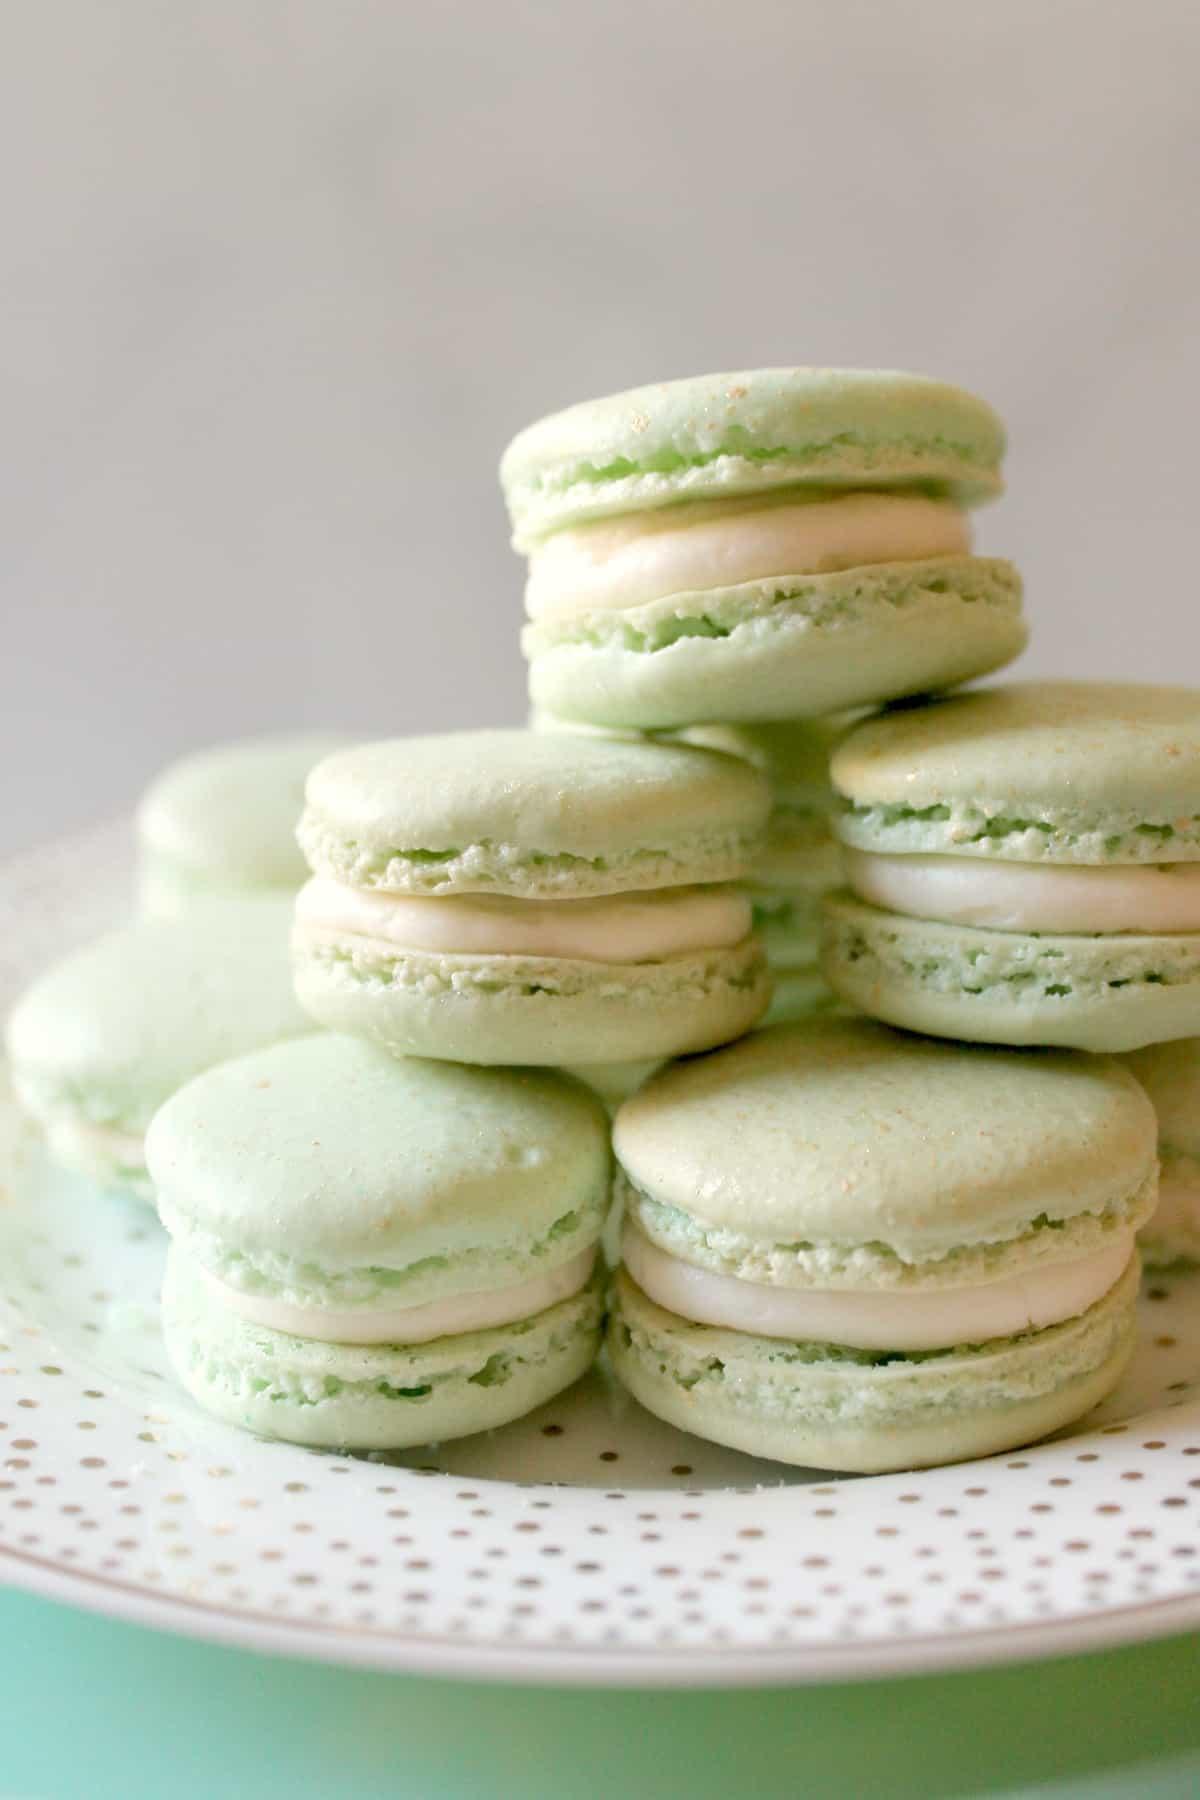 Creamy Irish Cream buttercream and crunchy macron cookies make these Irish Cream French Macarons a sinfully sweet dessert